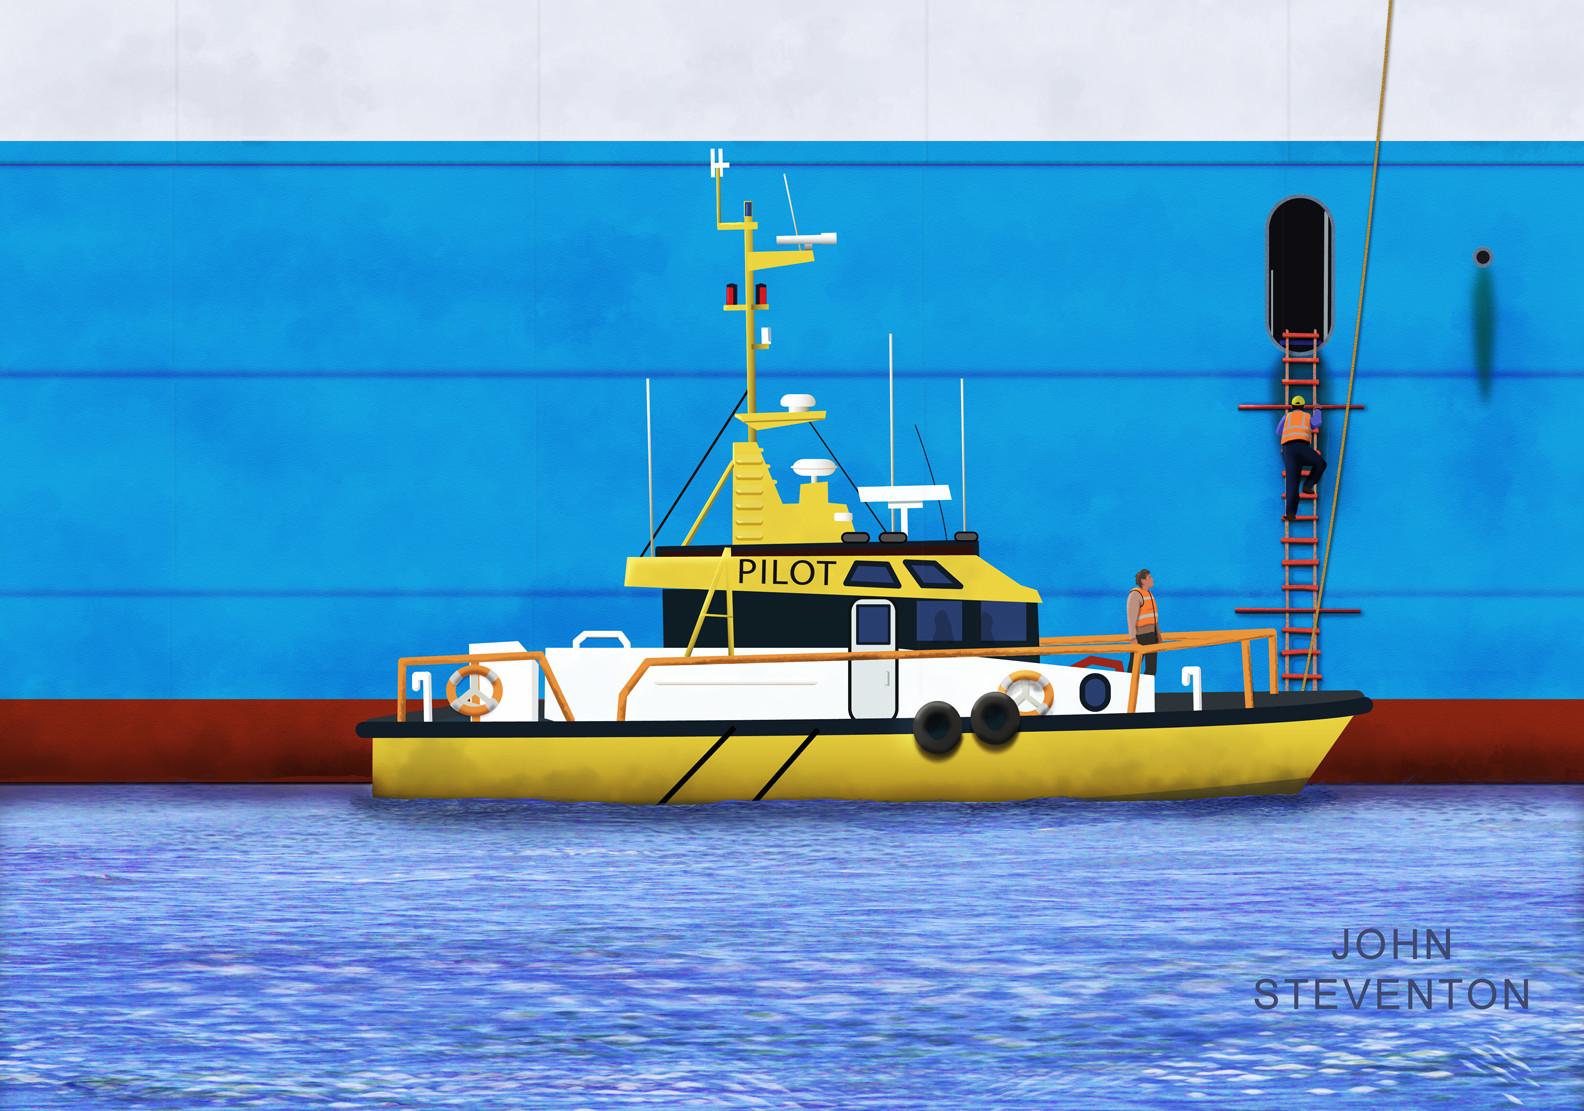 Pilot Boarding Ship